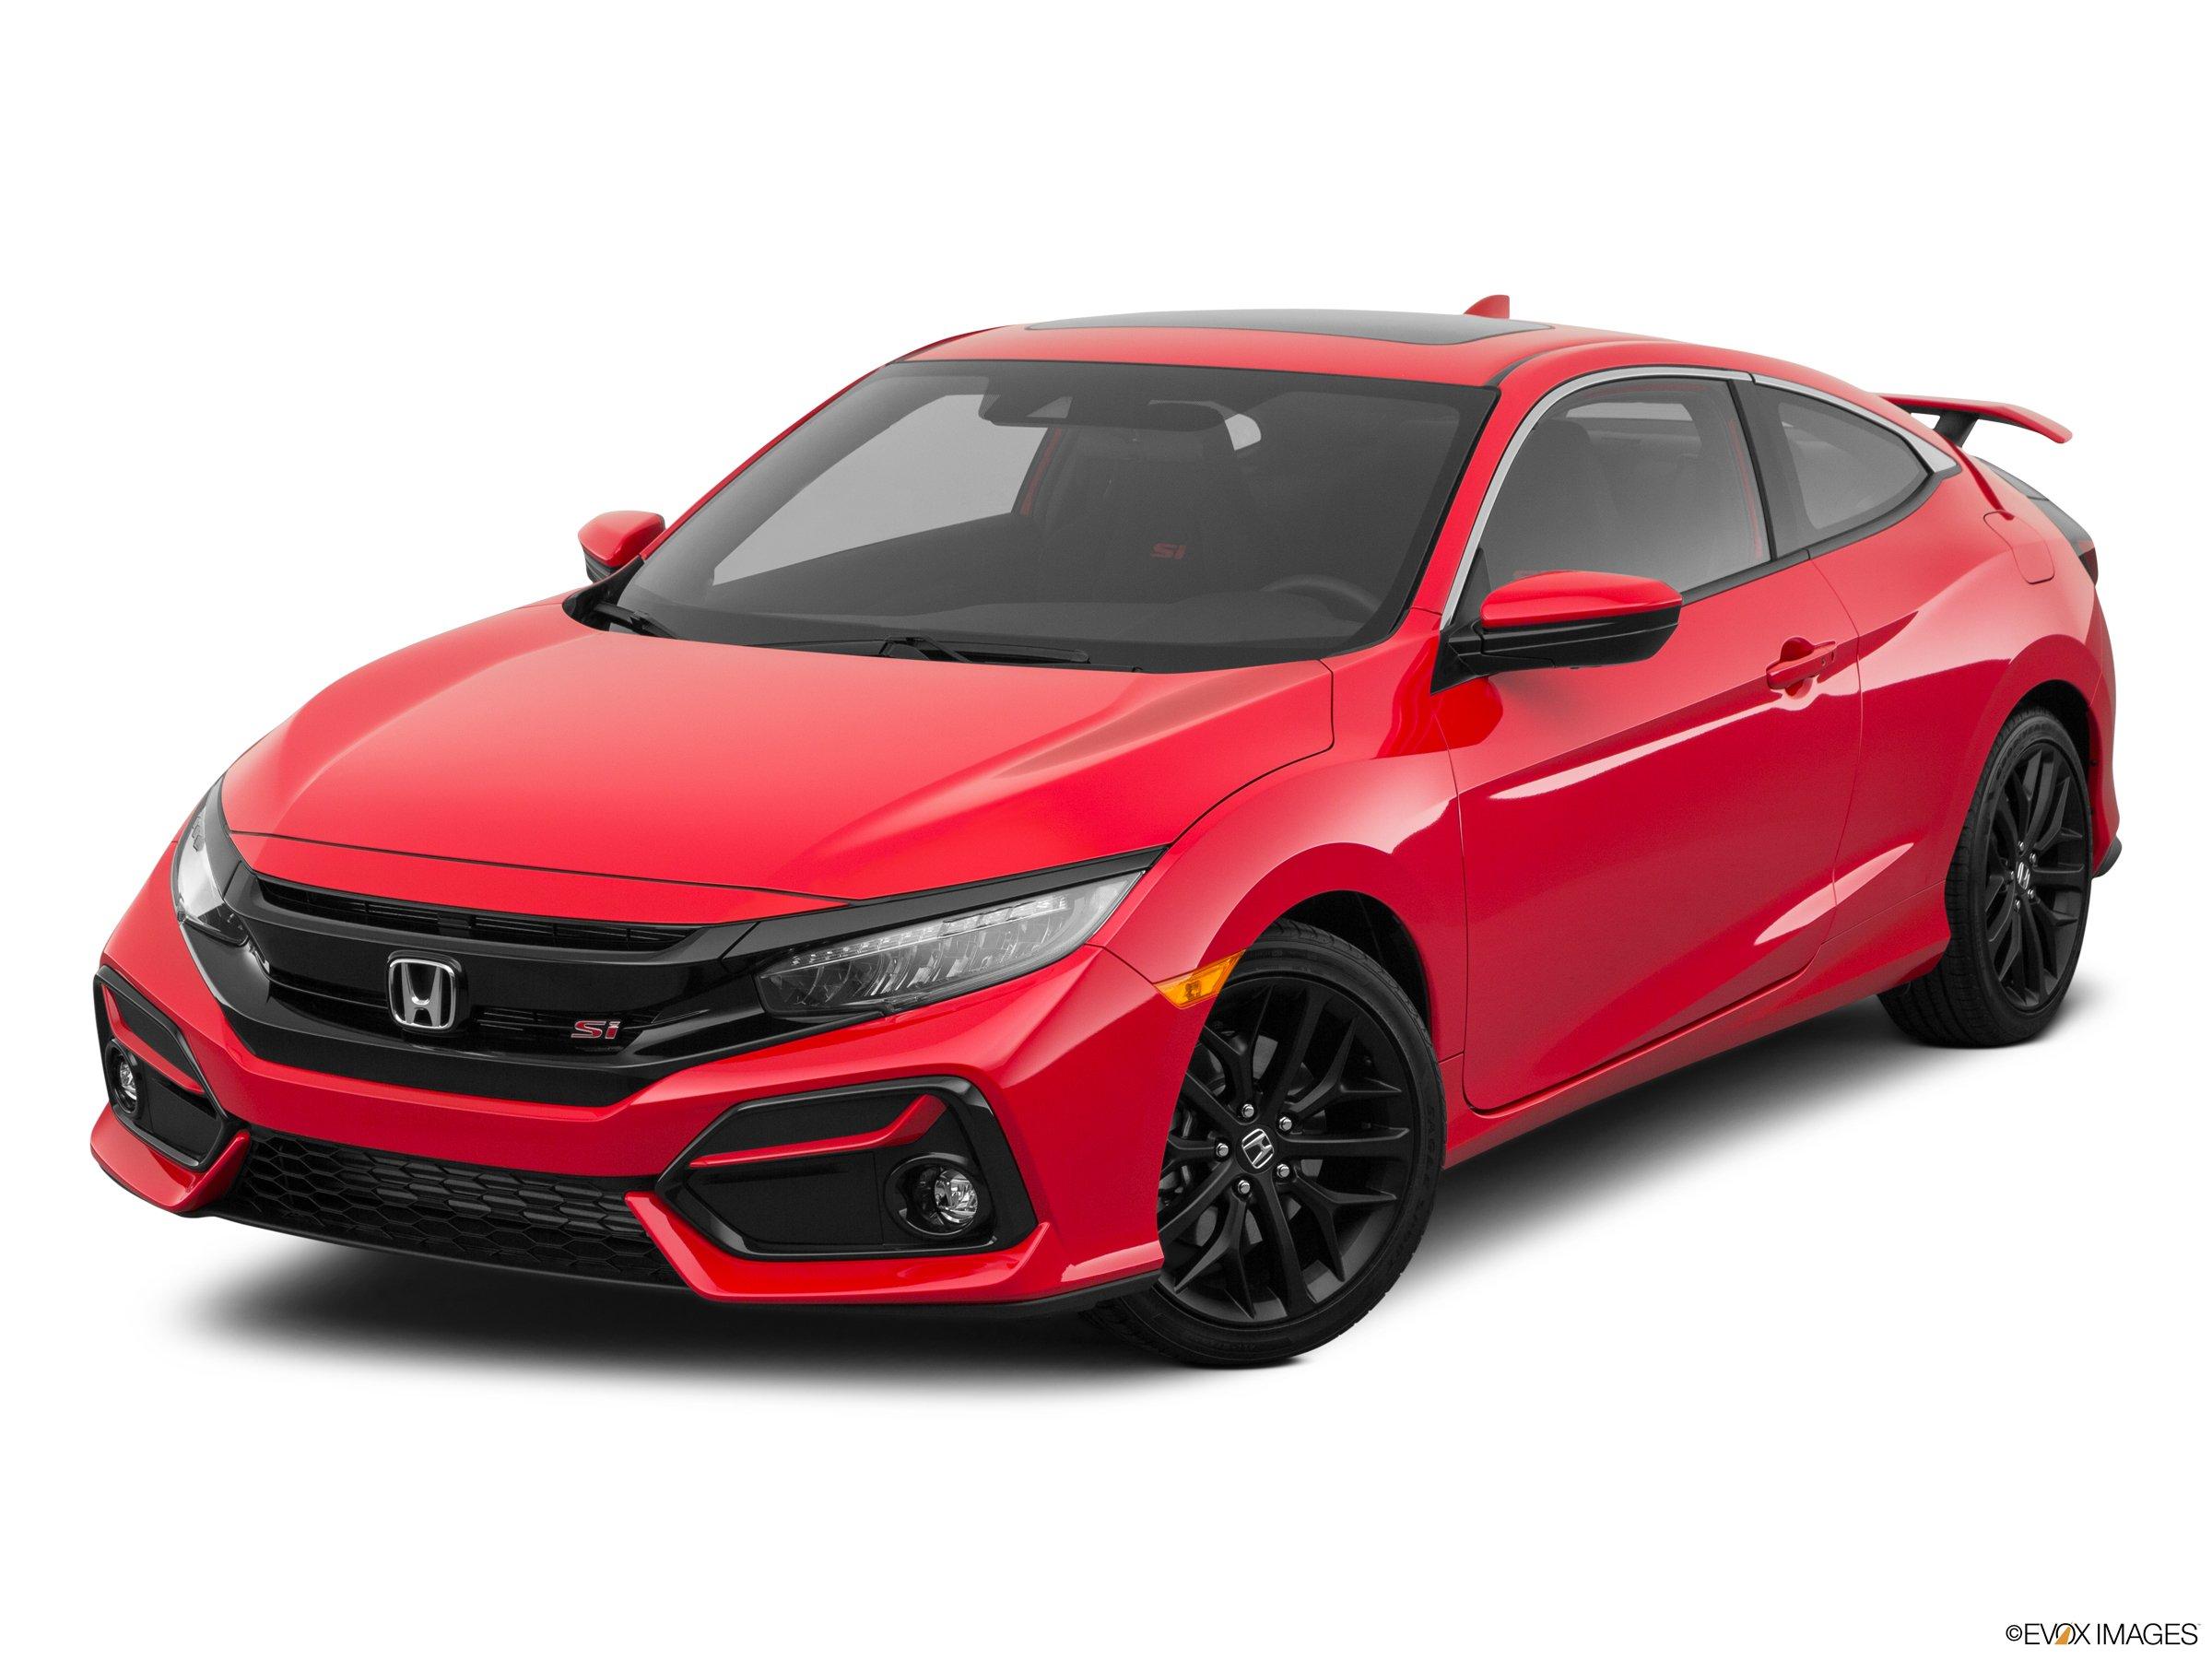 2020 Honda Civic Si FWD coupe